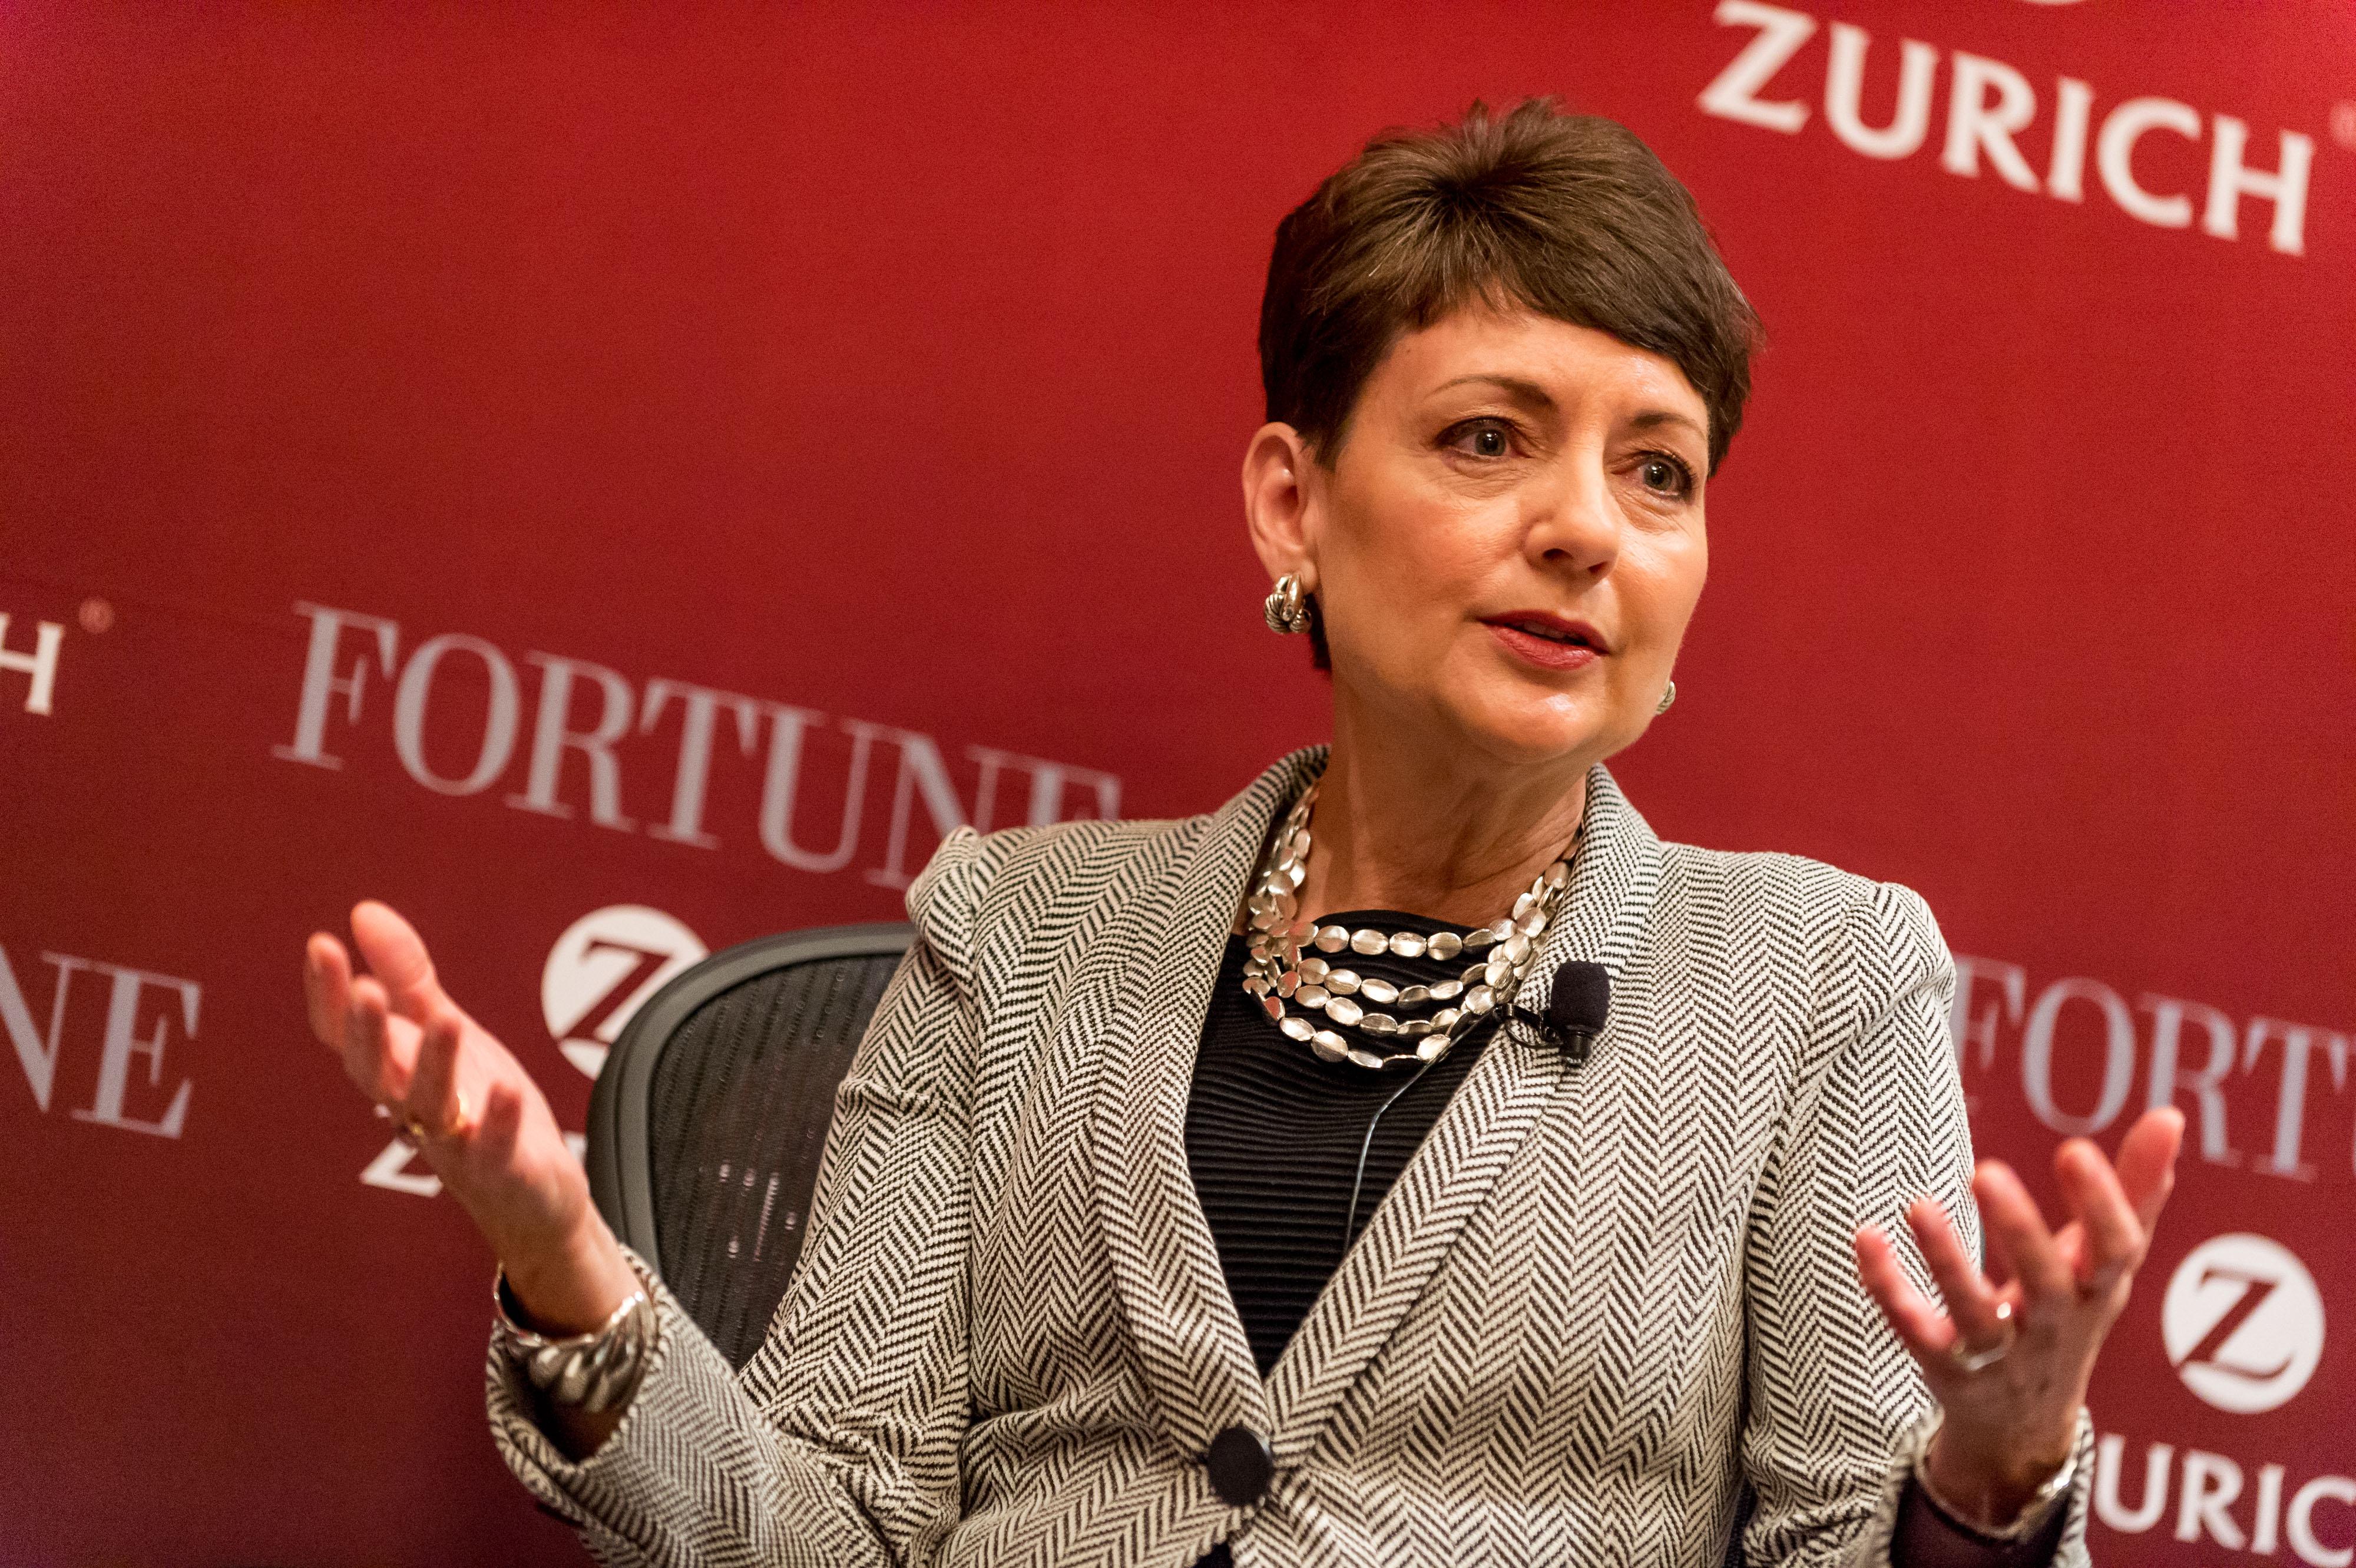 Fortune Most Powerful Women Summit 2015